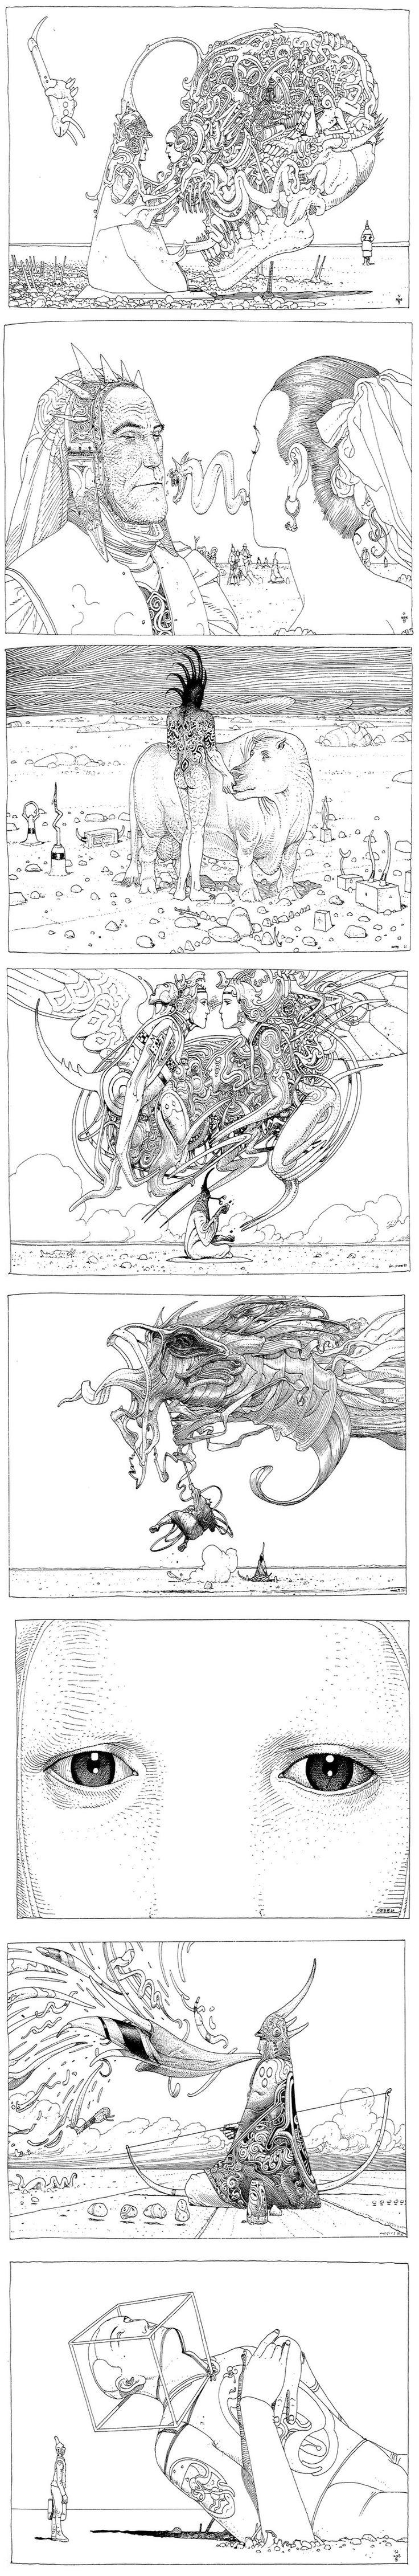 Moebius: Black & White sí tenéis un momento buscar este cómic son 100 páginas de genialidades con un mismo contexto el desierto!!